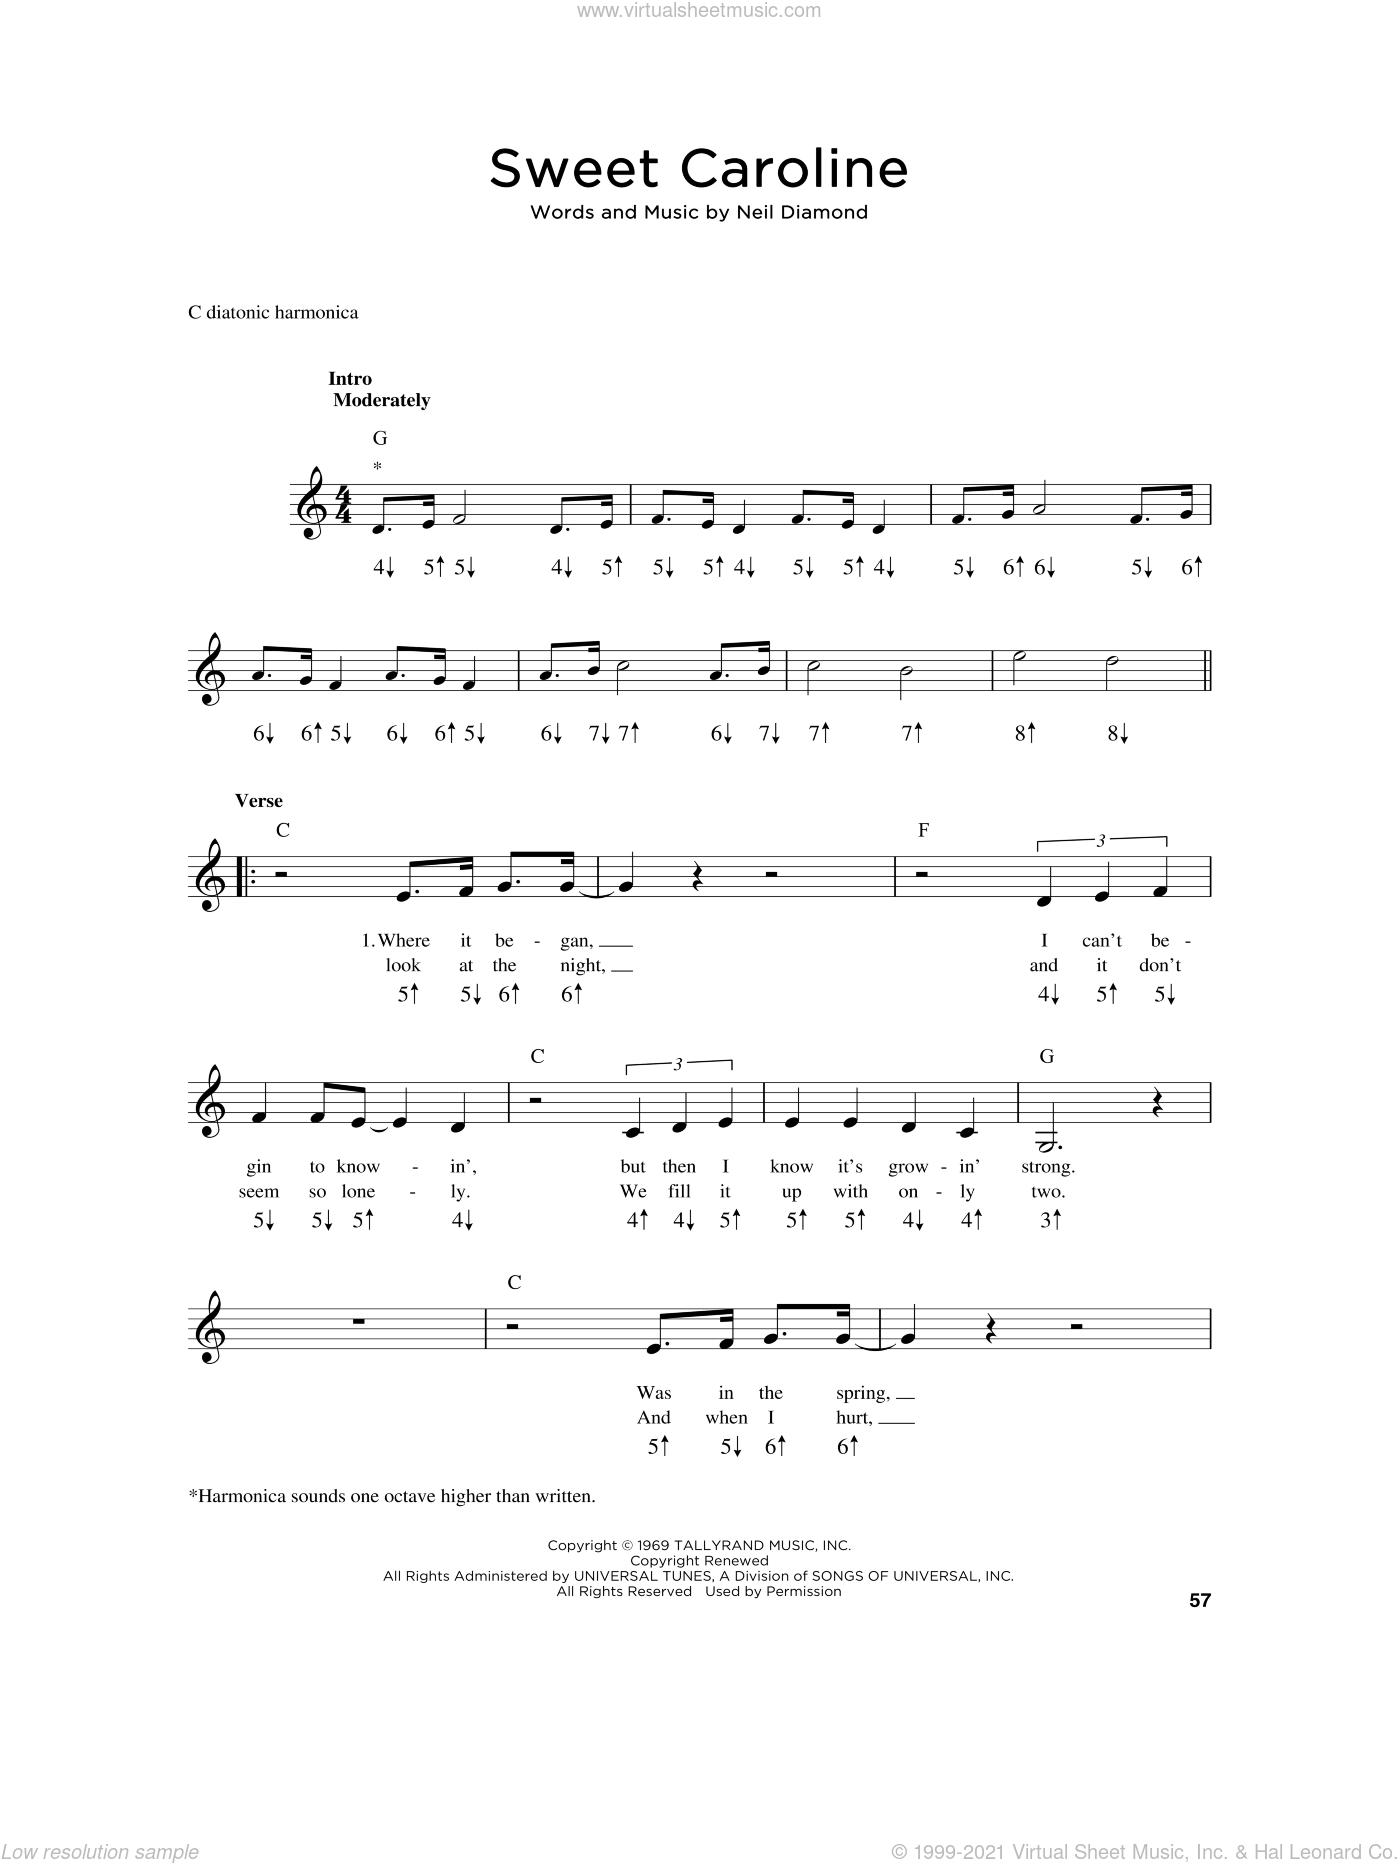 Sweet Caroline sheet music for harmonica solo by Neil Diamond, intermediate skill level